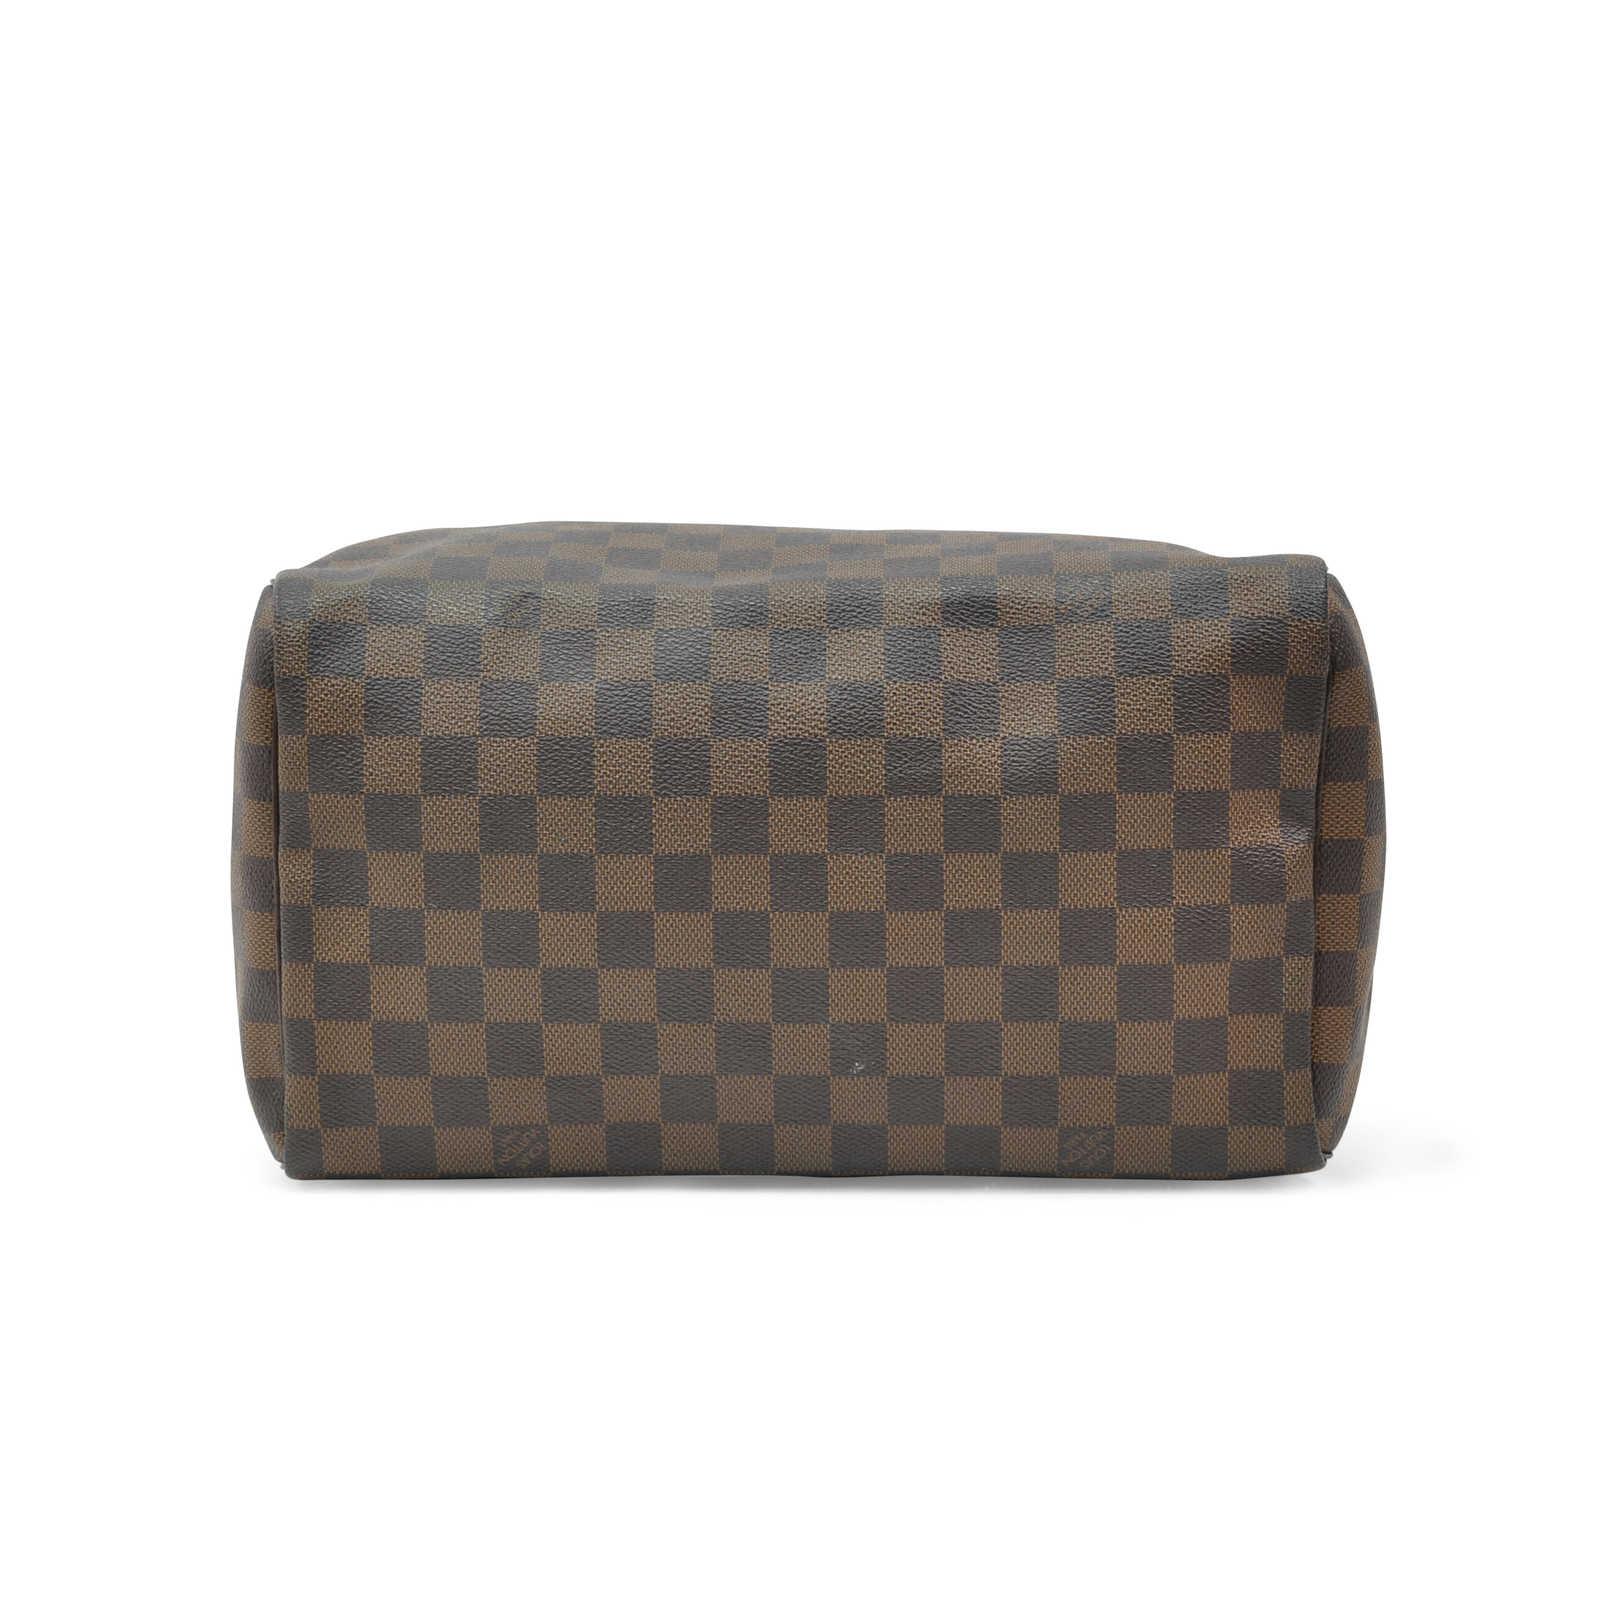 f1b0154eb74 Authentic Second Hand Louis Vuitton Damier Ebene Speedy 30 (PSS-321 ...